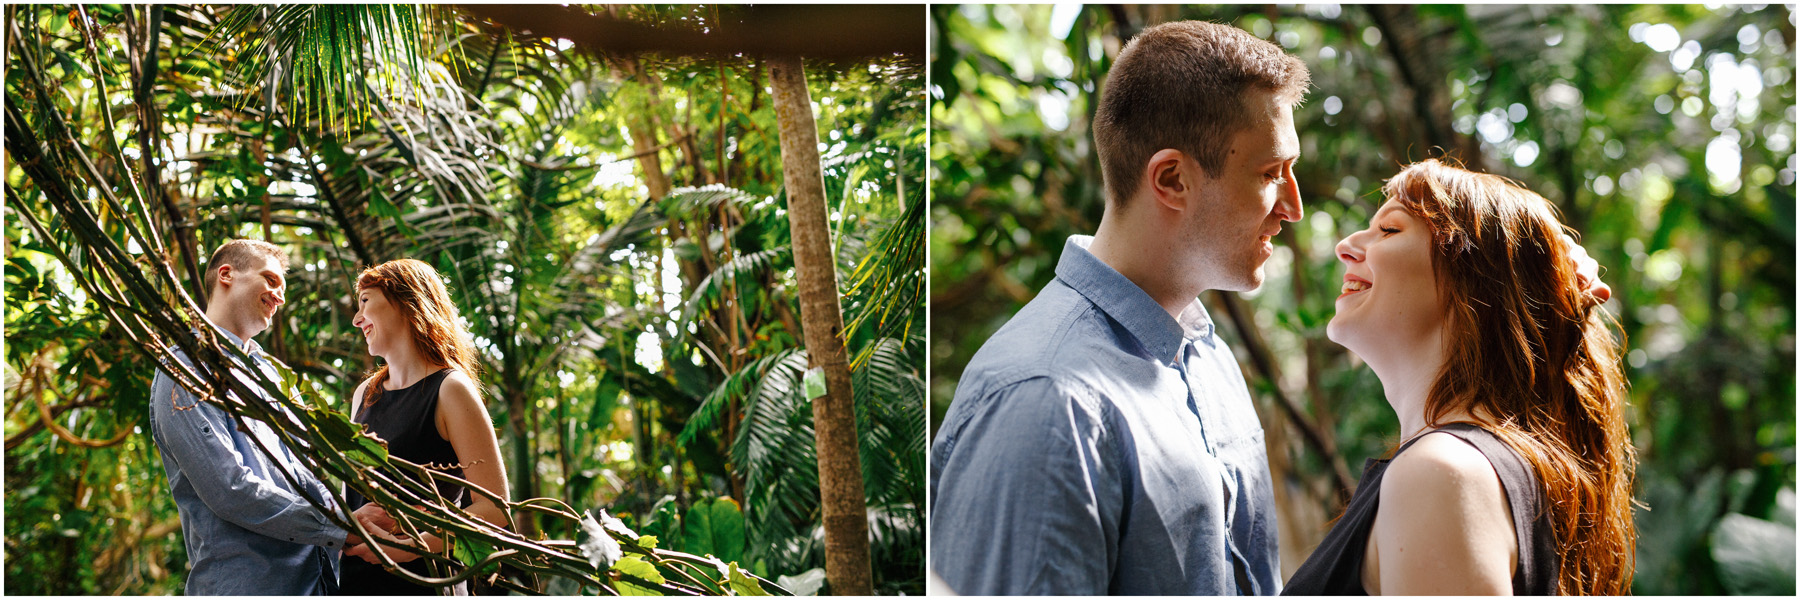 Monika & Damian | sesja w palmiarni 10